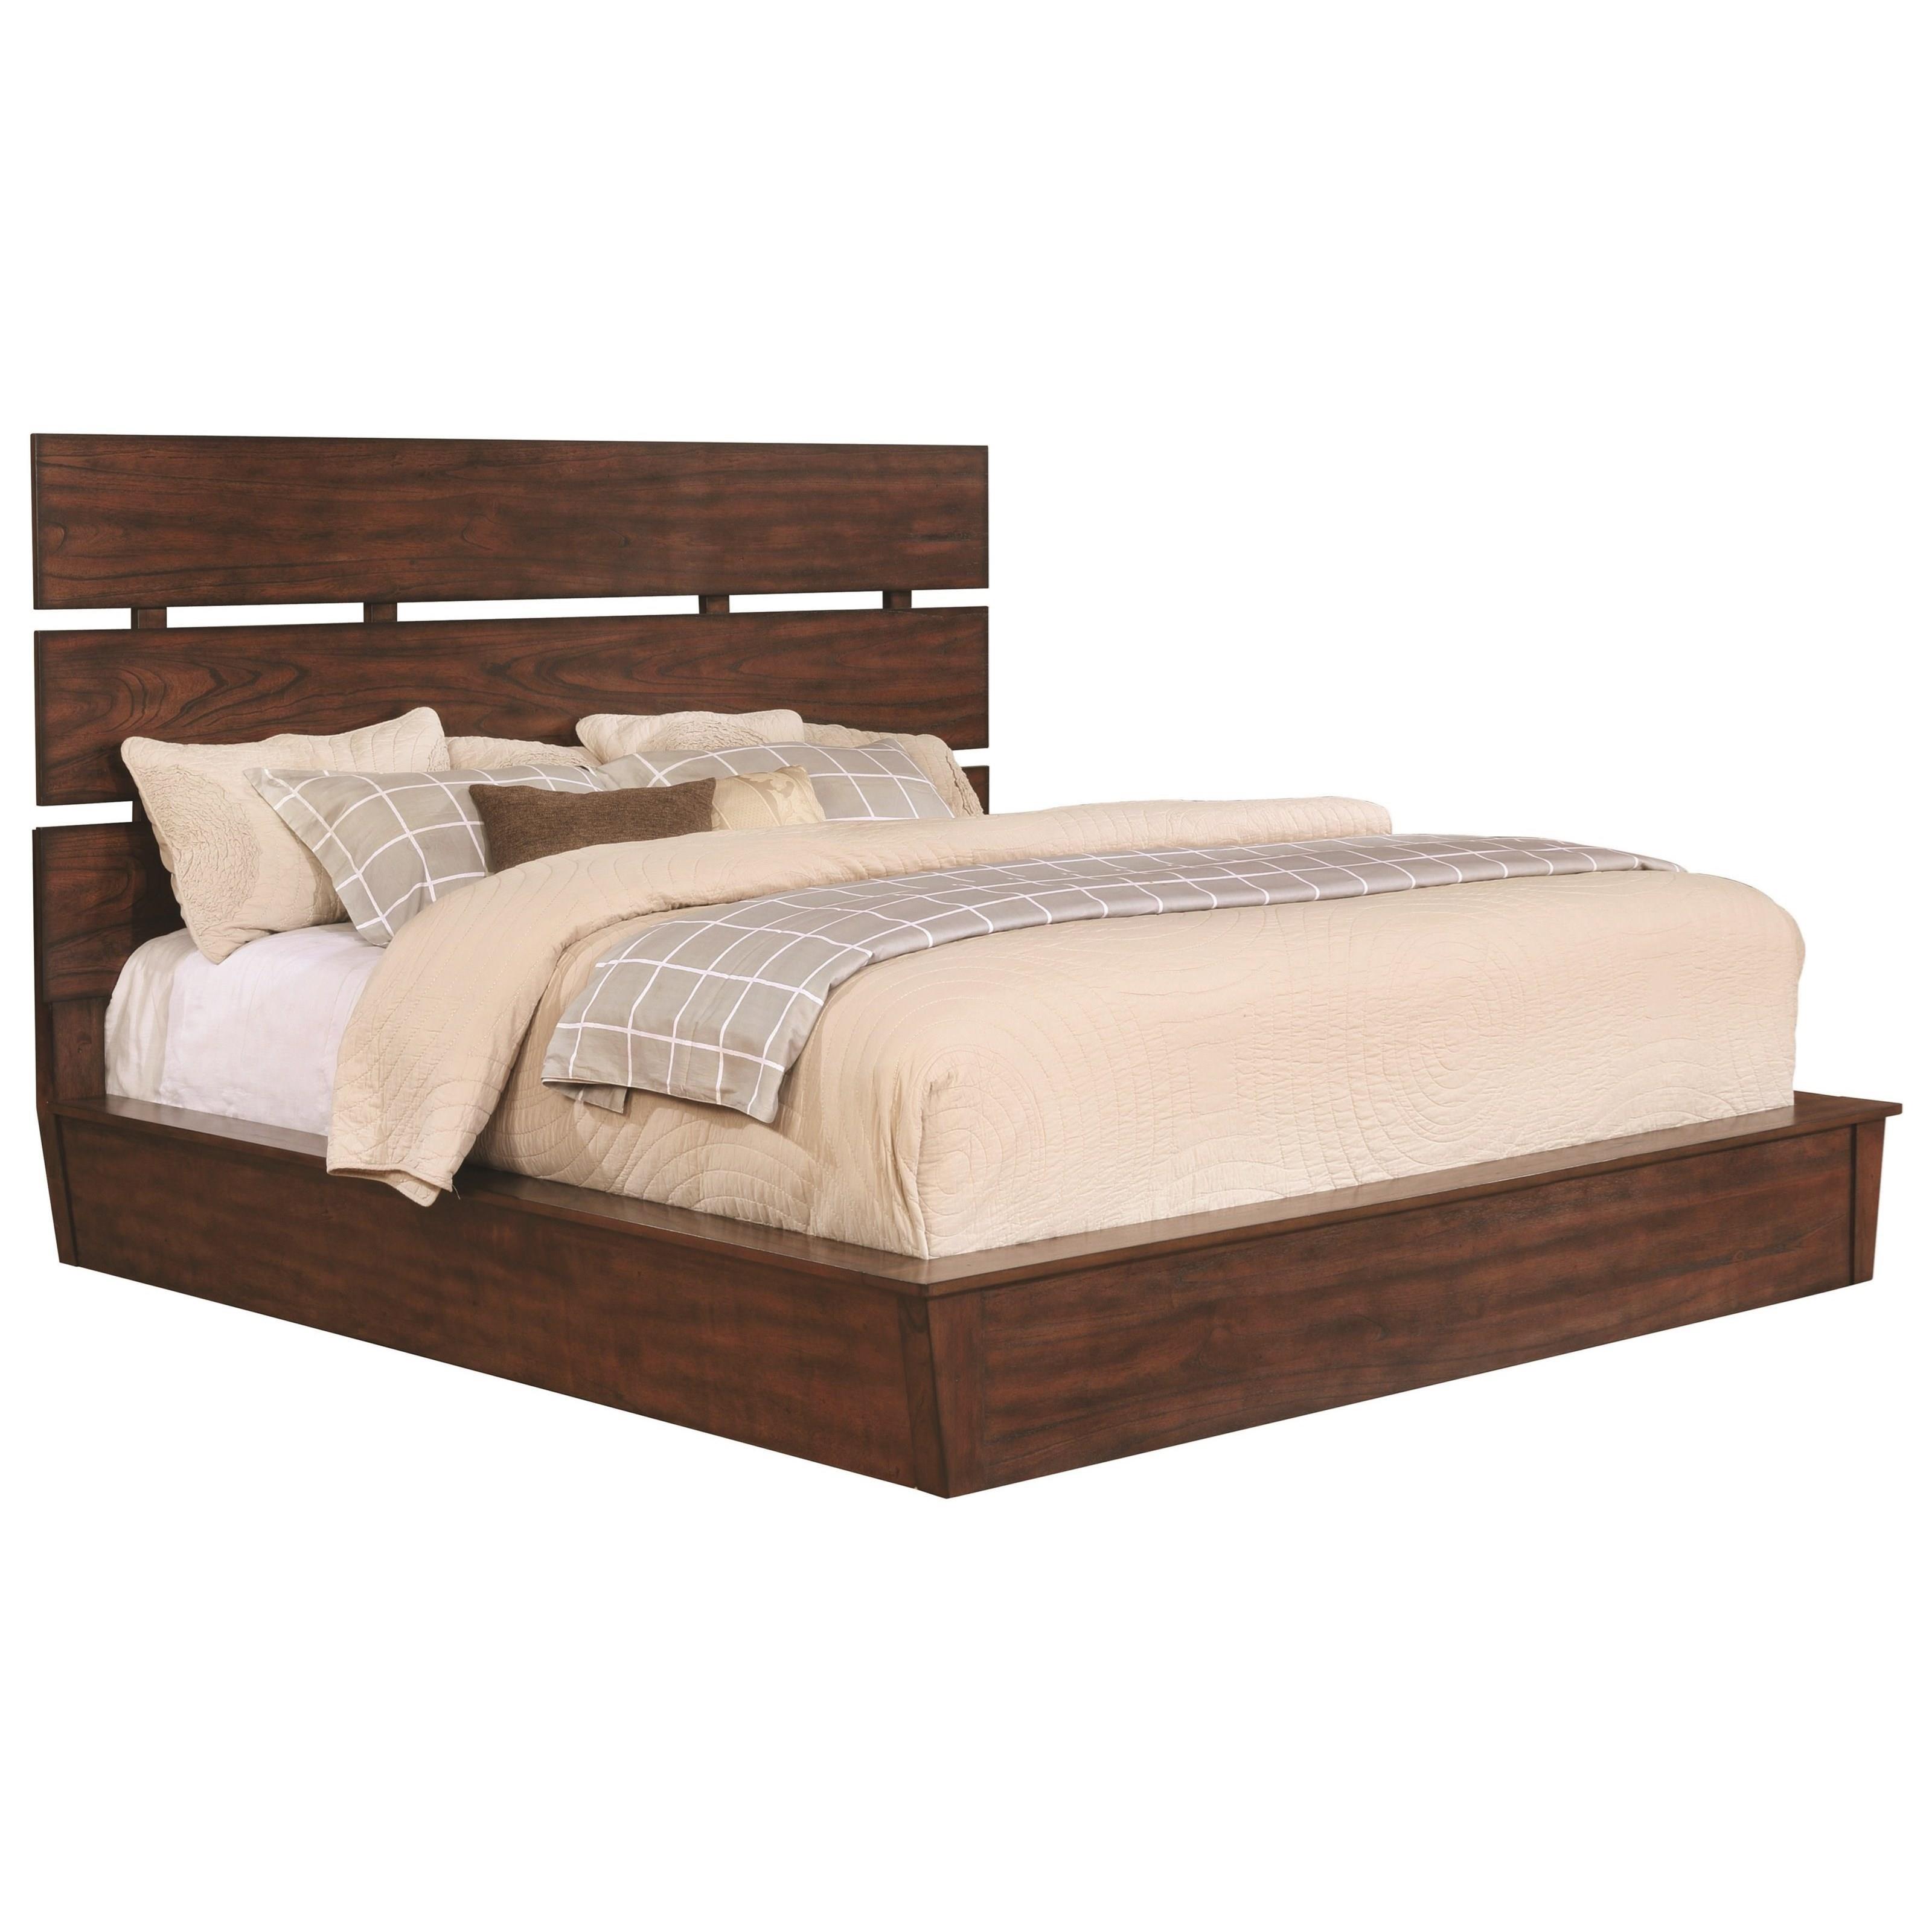 Scott Living Artesia Cal King Bed - Item Number: 204471KW